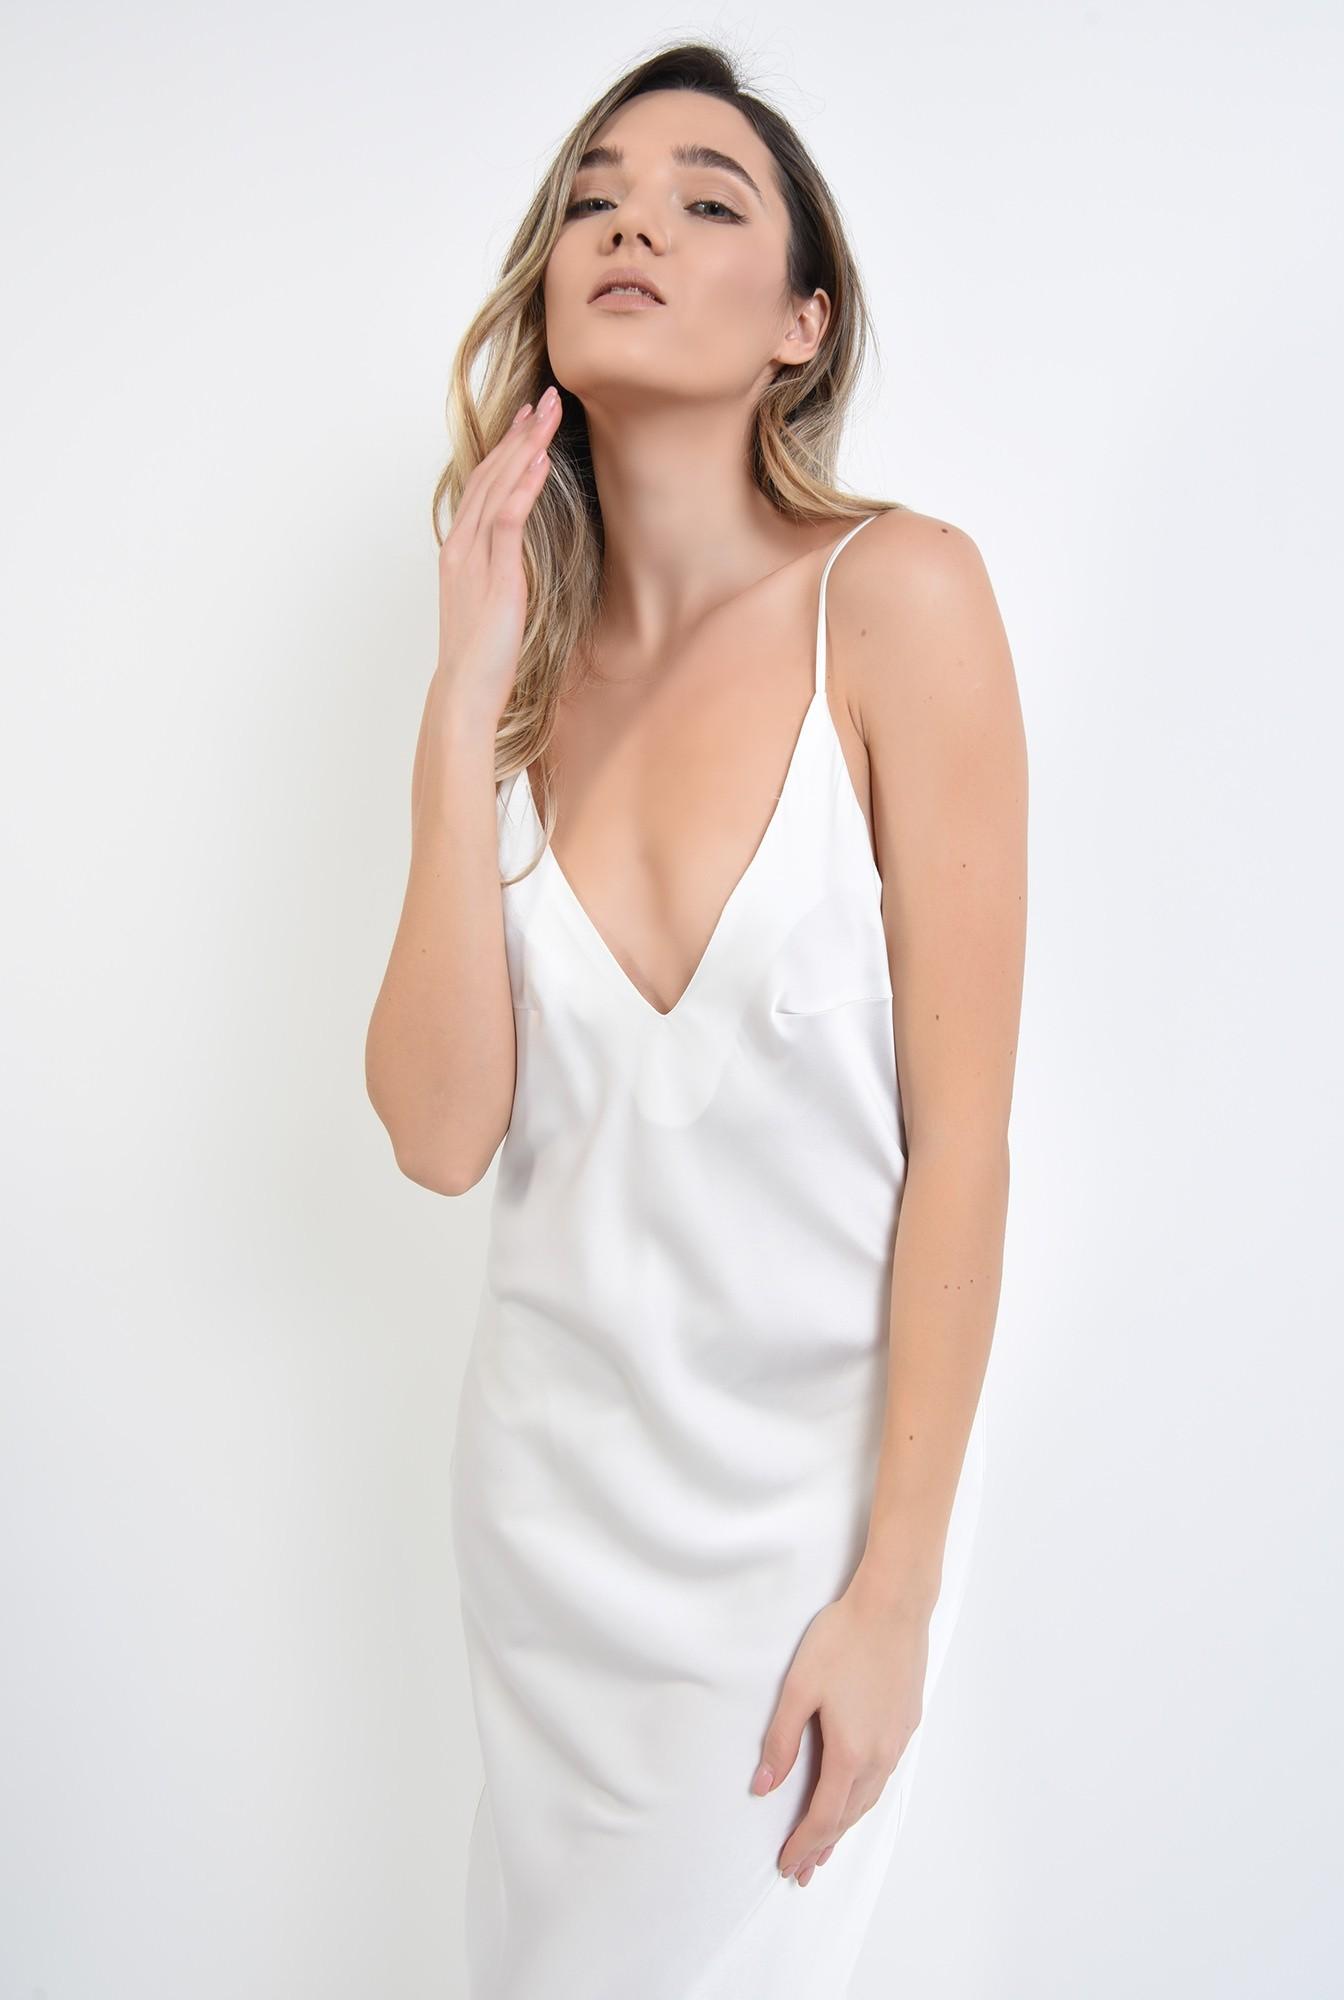 3 - rochie alba, din satin, cu bretele subtiri